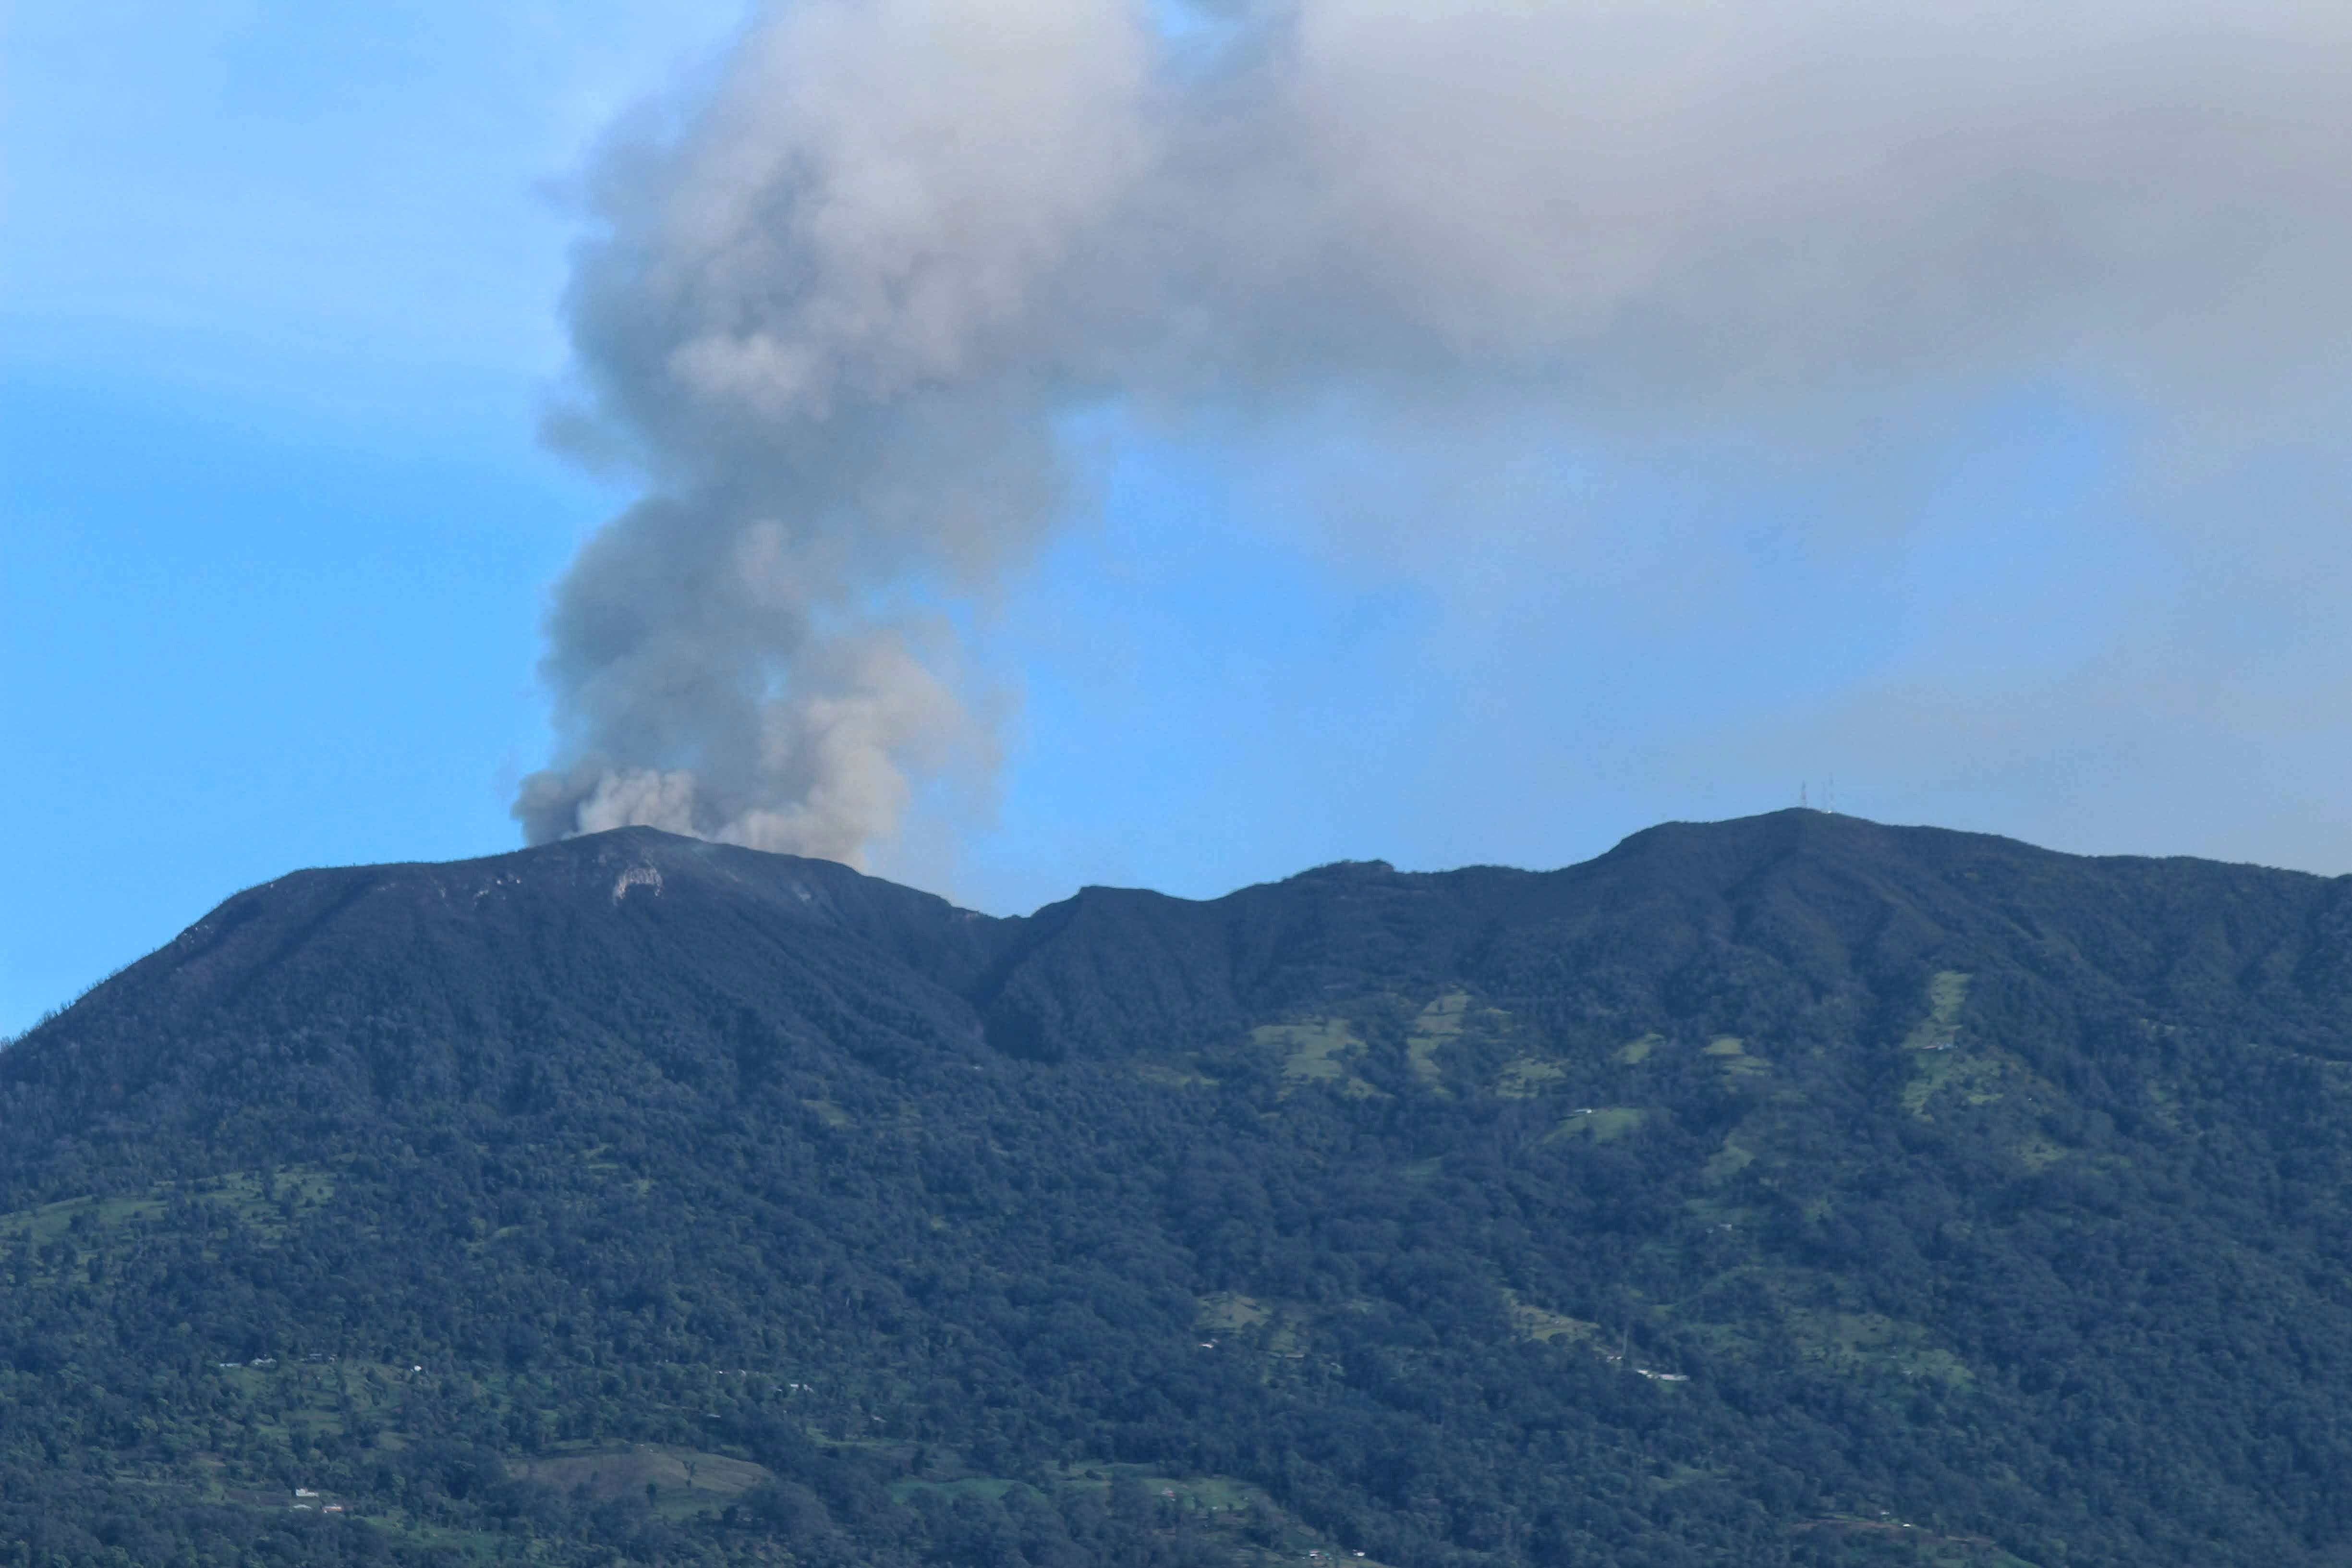 Free stock photo of Volcan Turrialba